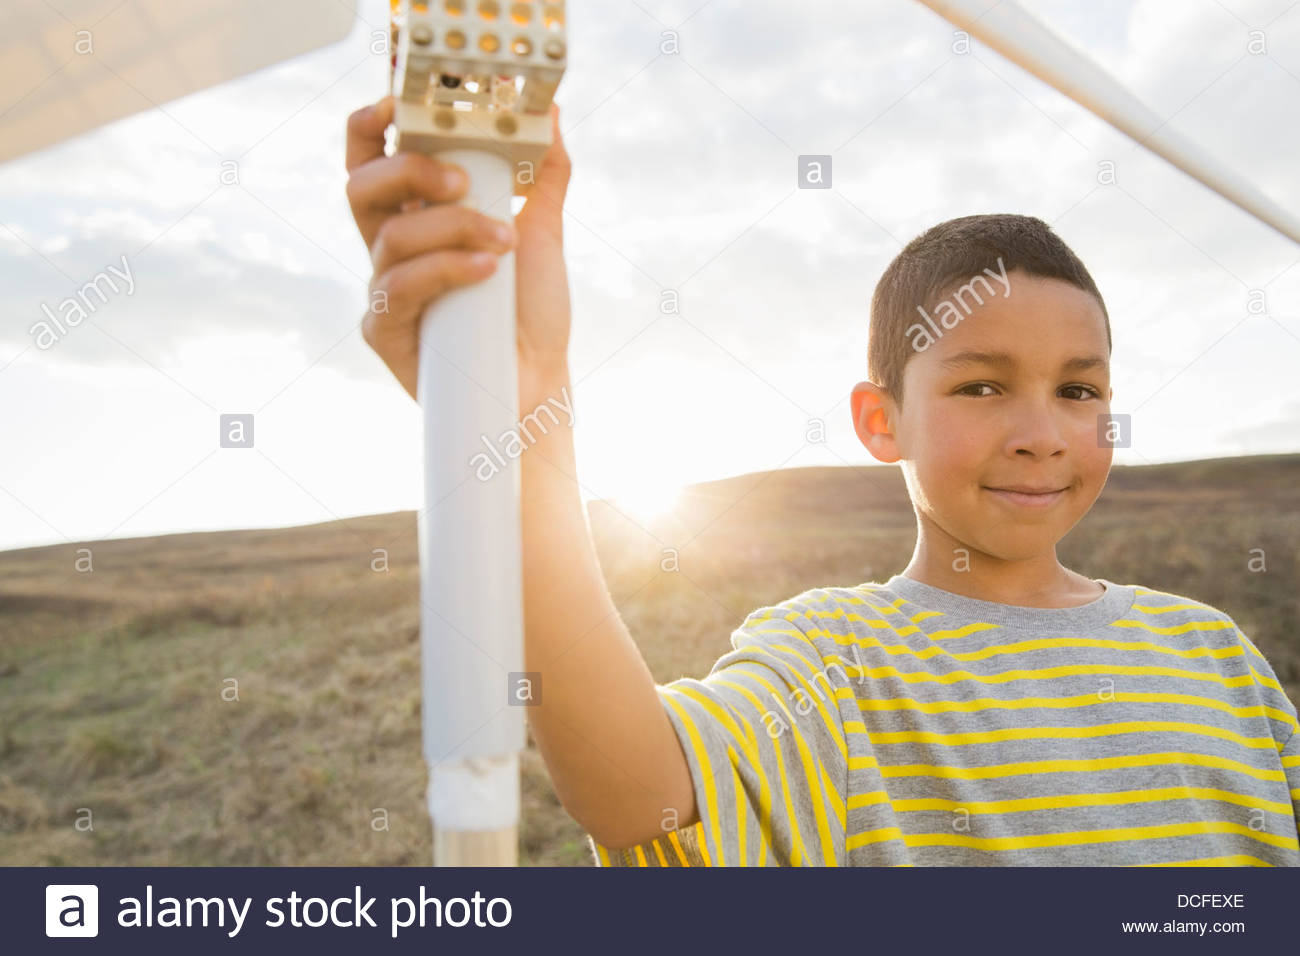 Portrait of boy holding wind turbine model - Stock Image